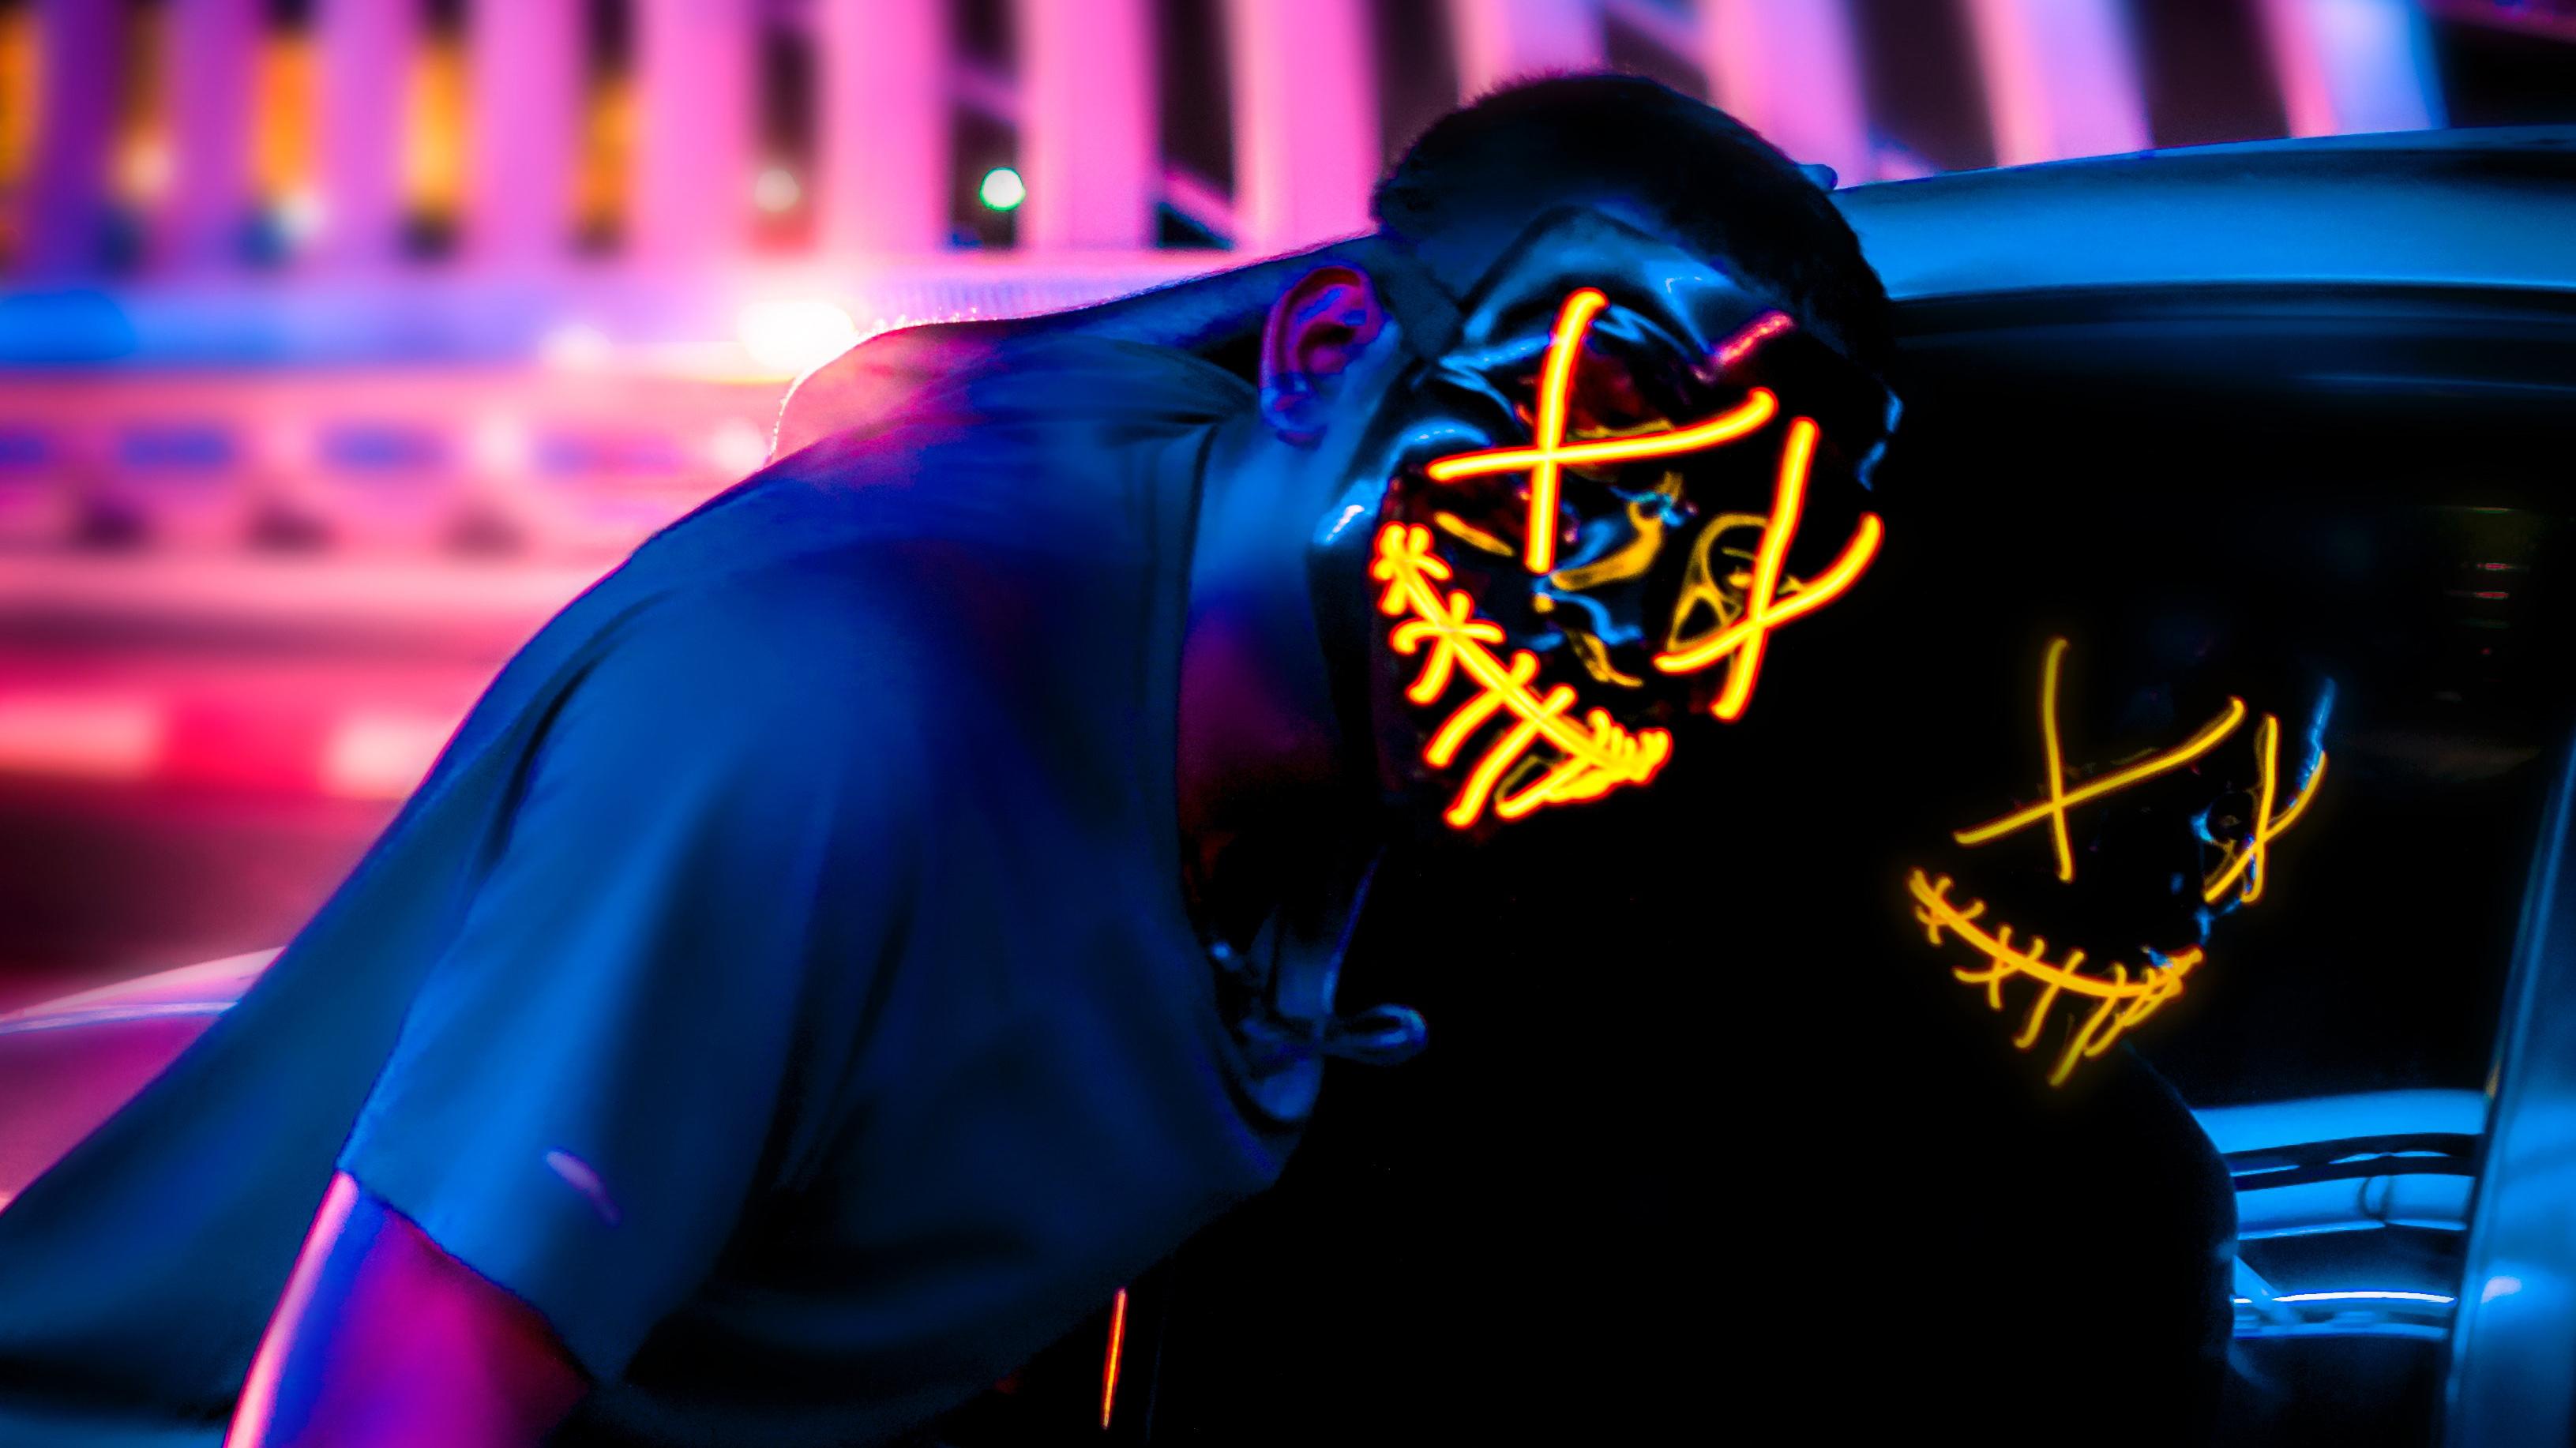 Neon Danger Mask Wallpapers Wallpaper Cave